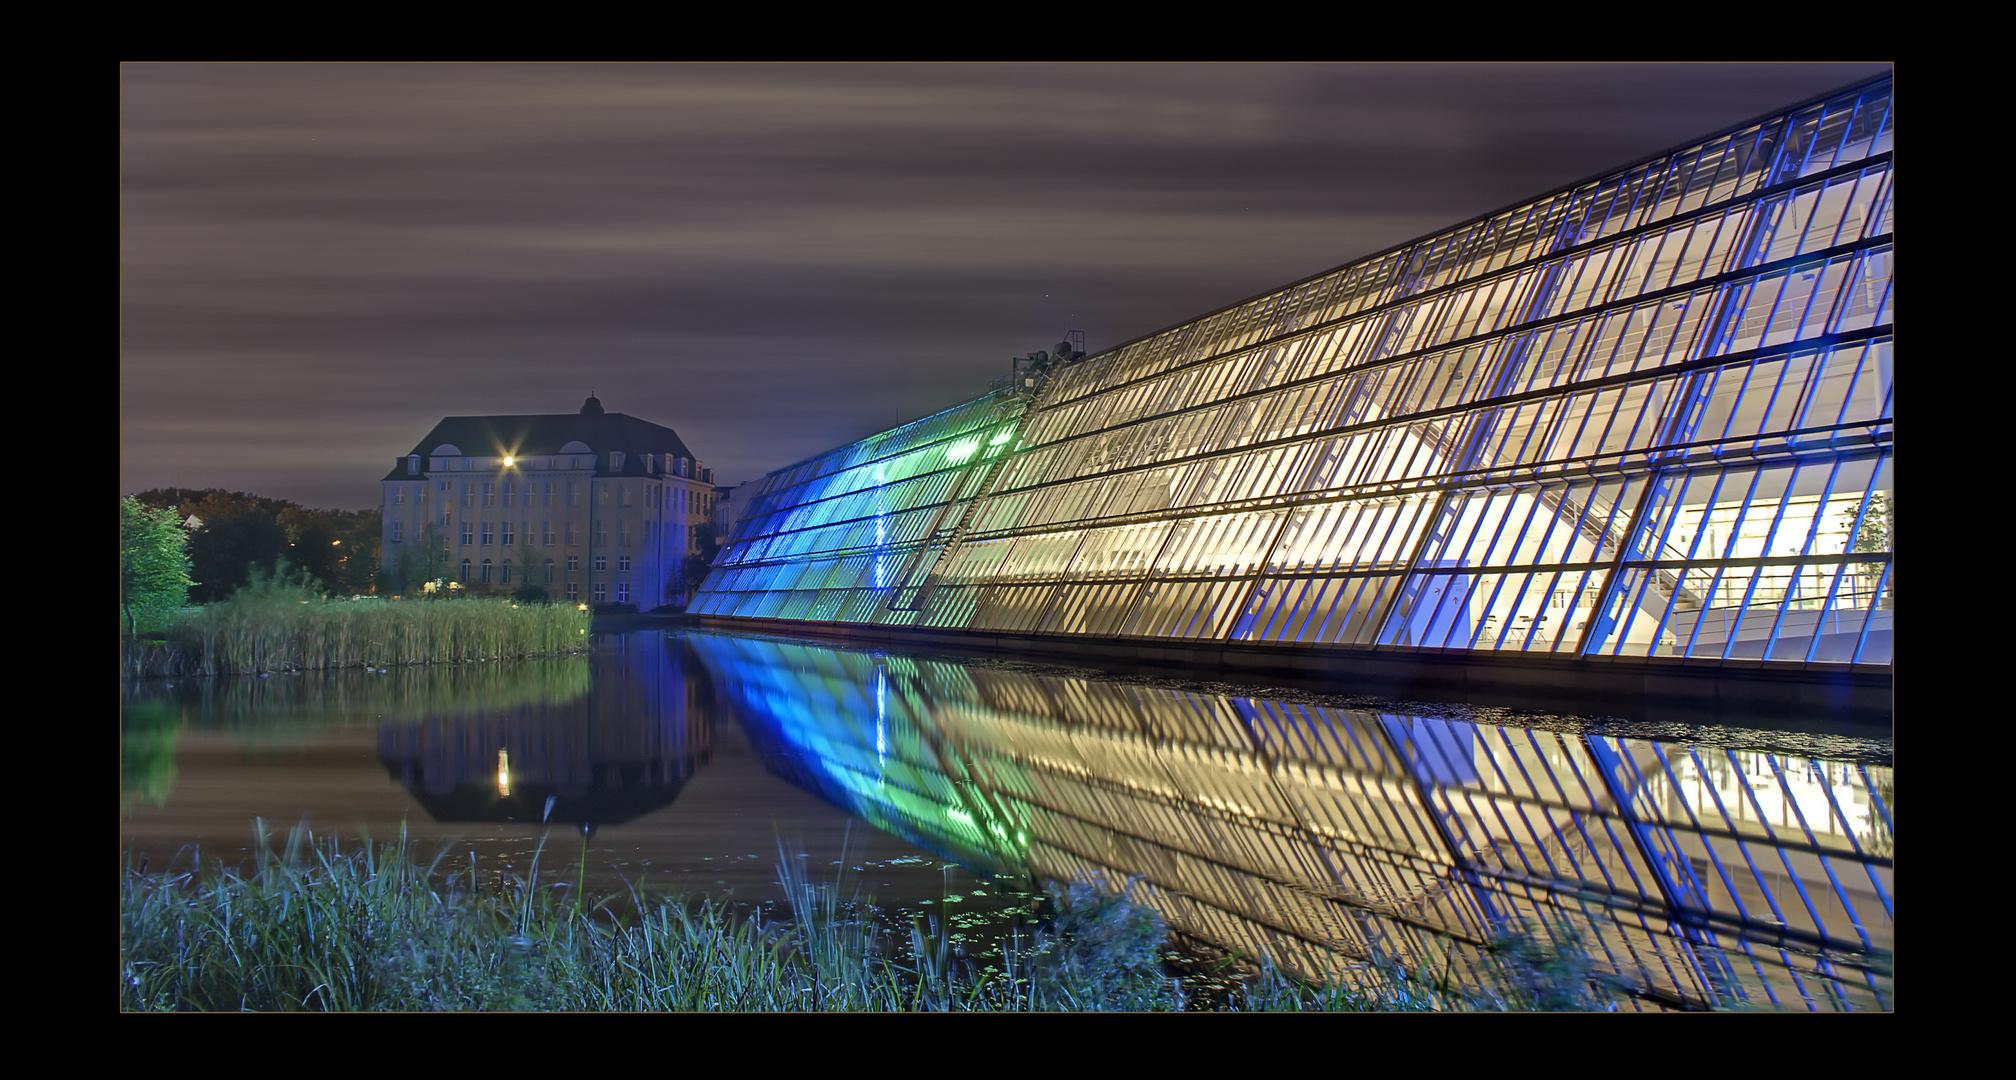 Wissenschaftspark Gelsenkirchen